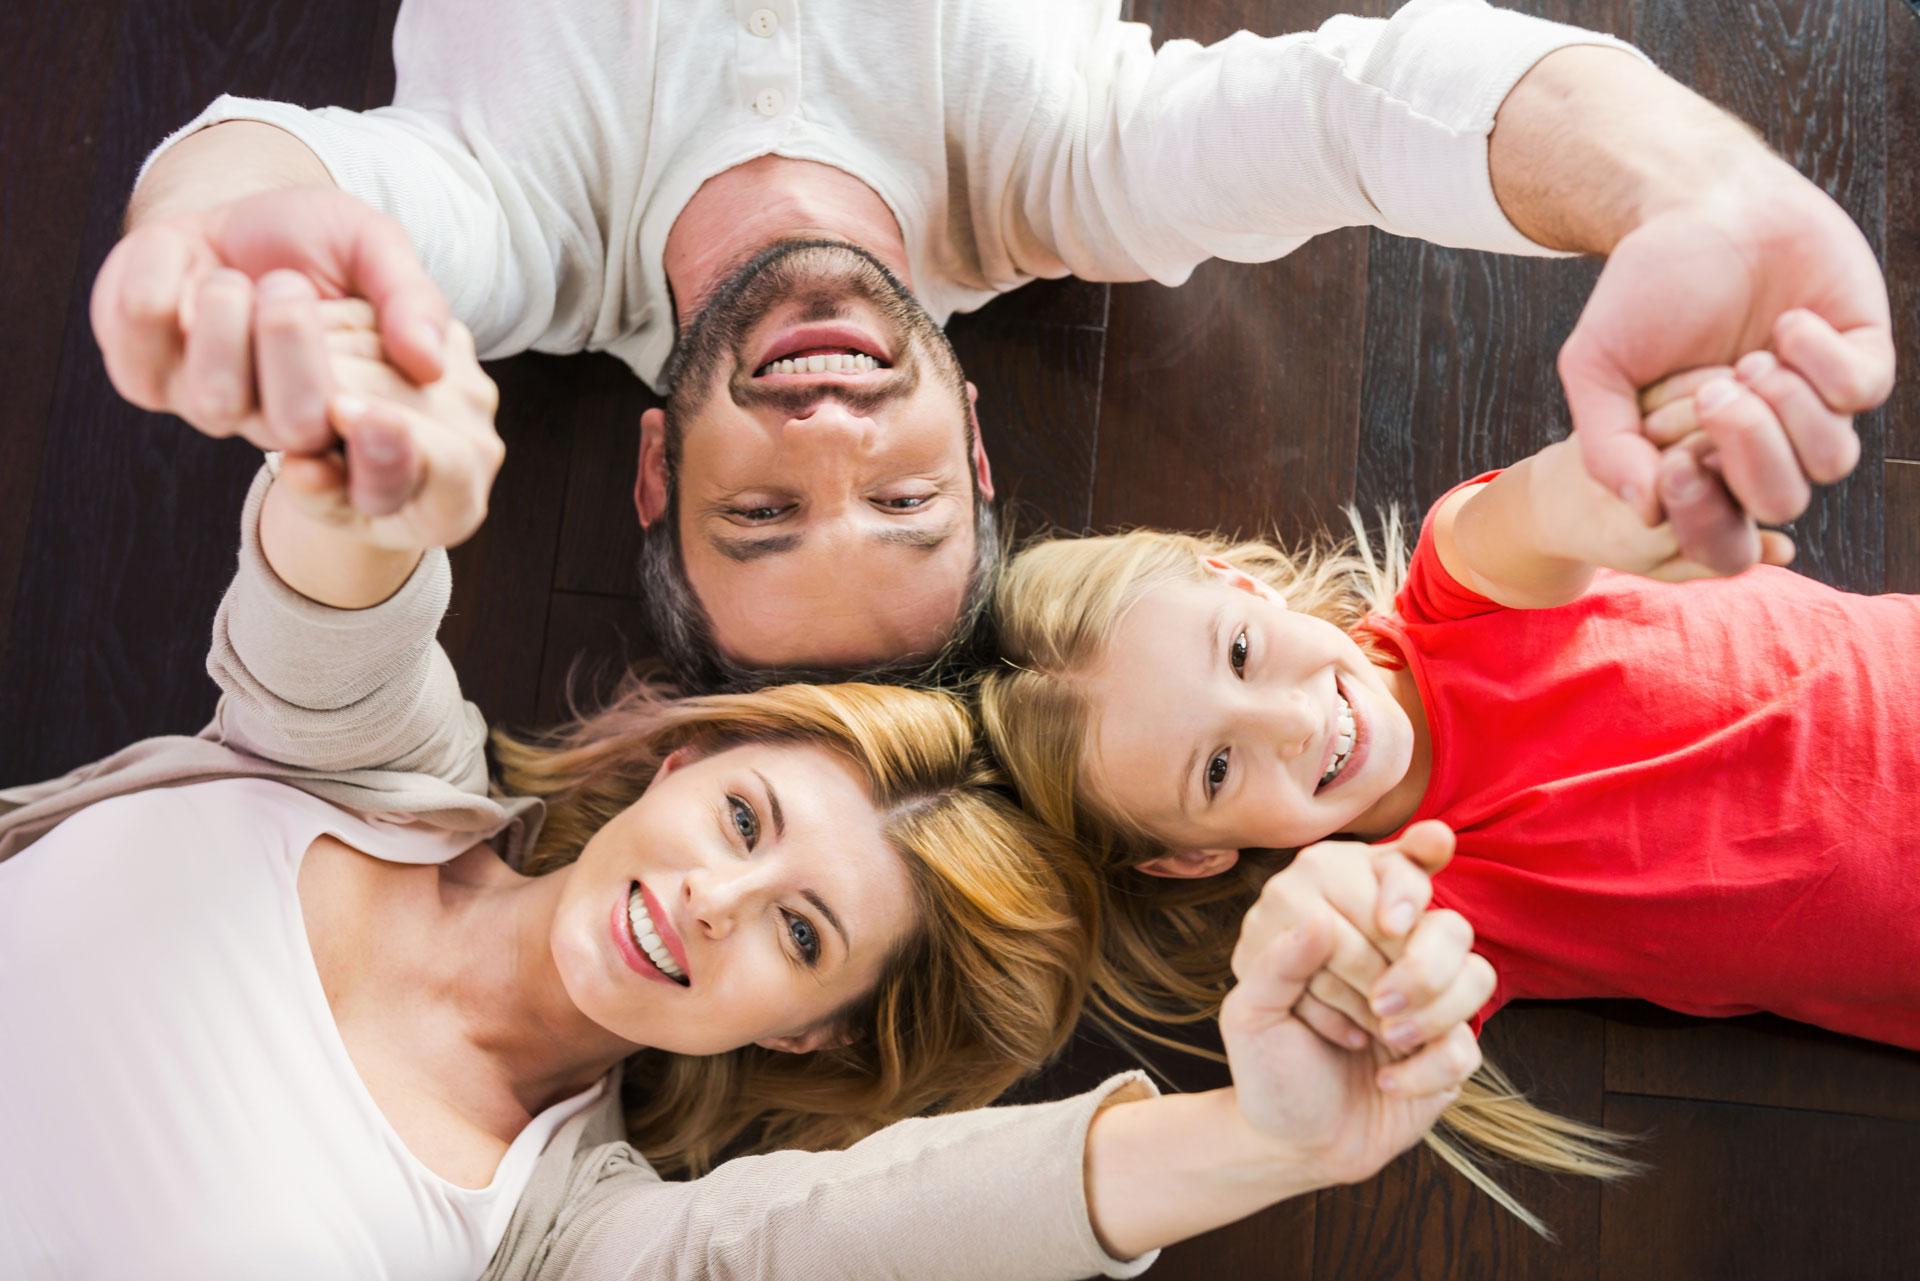 Rodinný oddychový pobyt